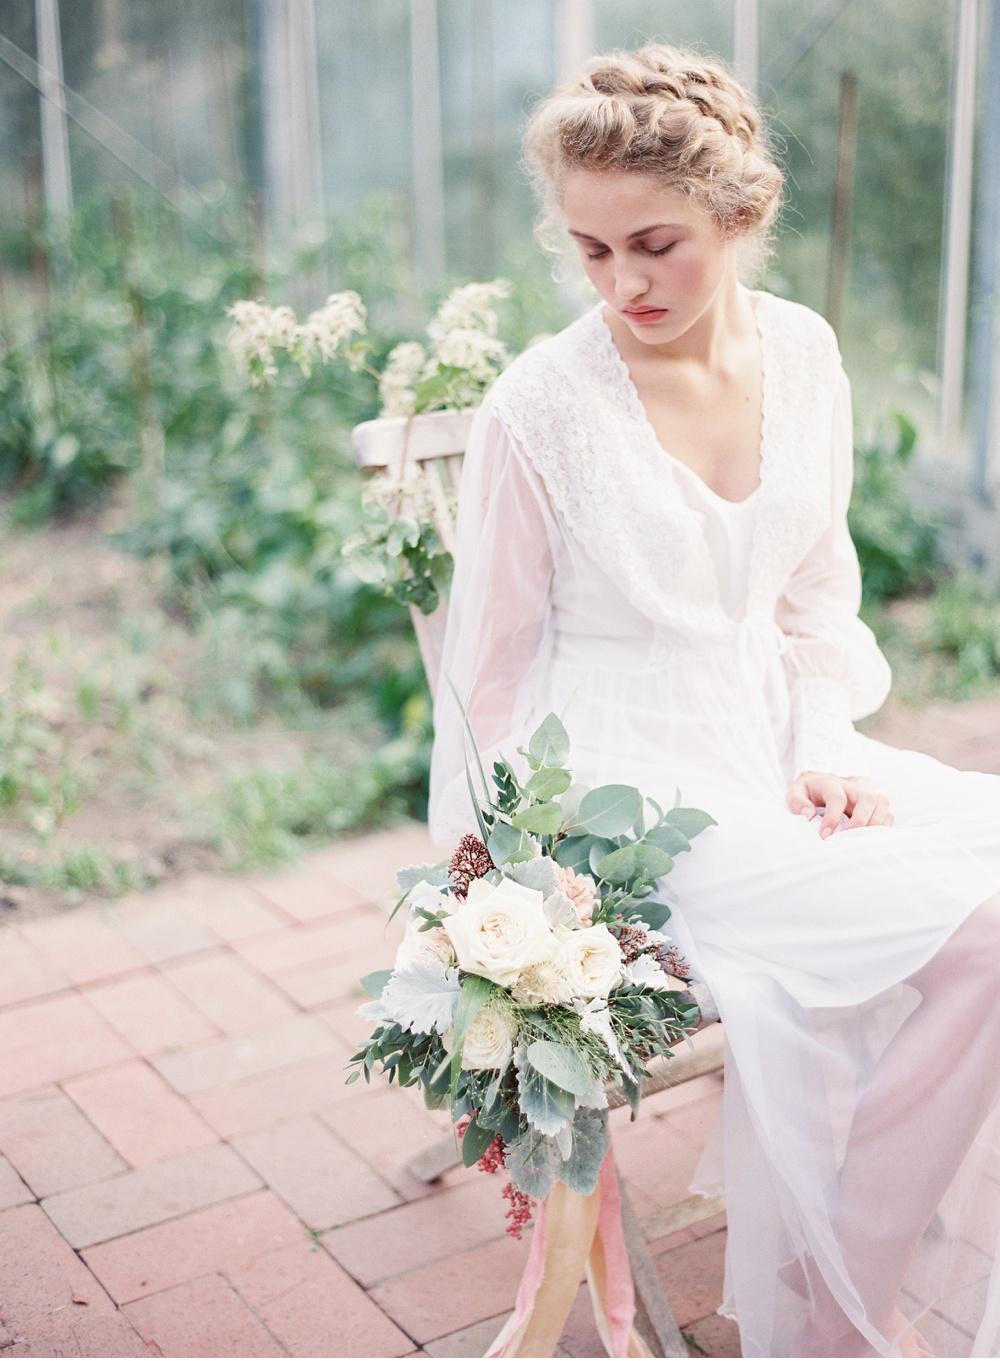 Greenhouse_wedding_inspiration©MadalinaSheldon_0019.jpg